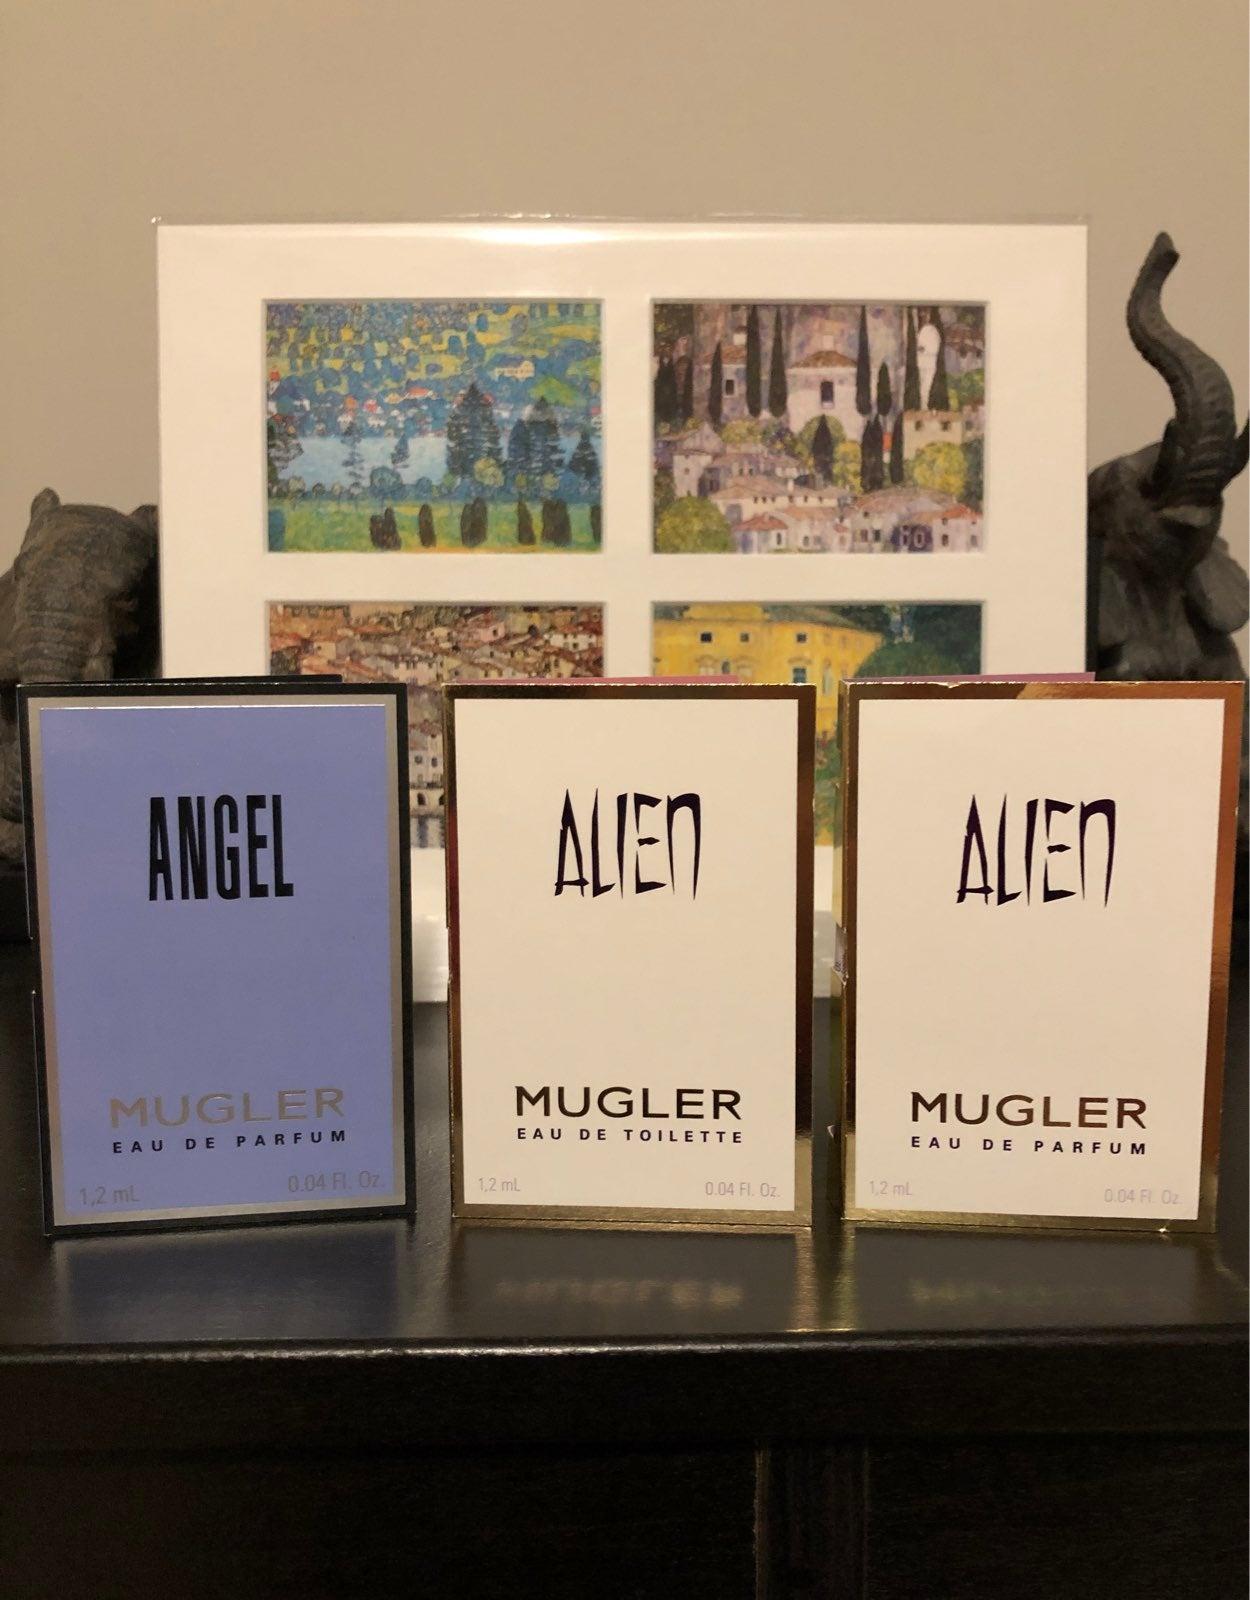 Theirry Mugler perfume samples